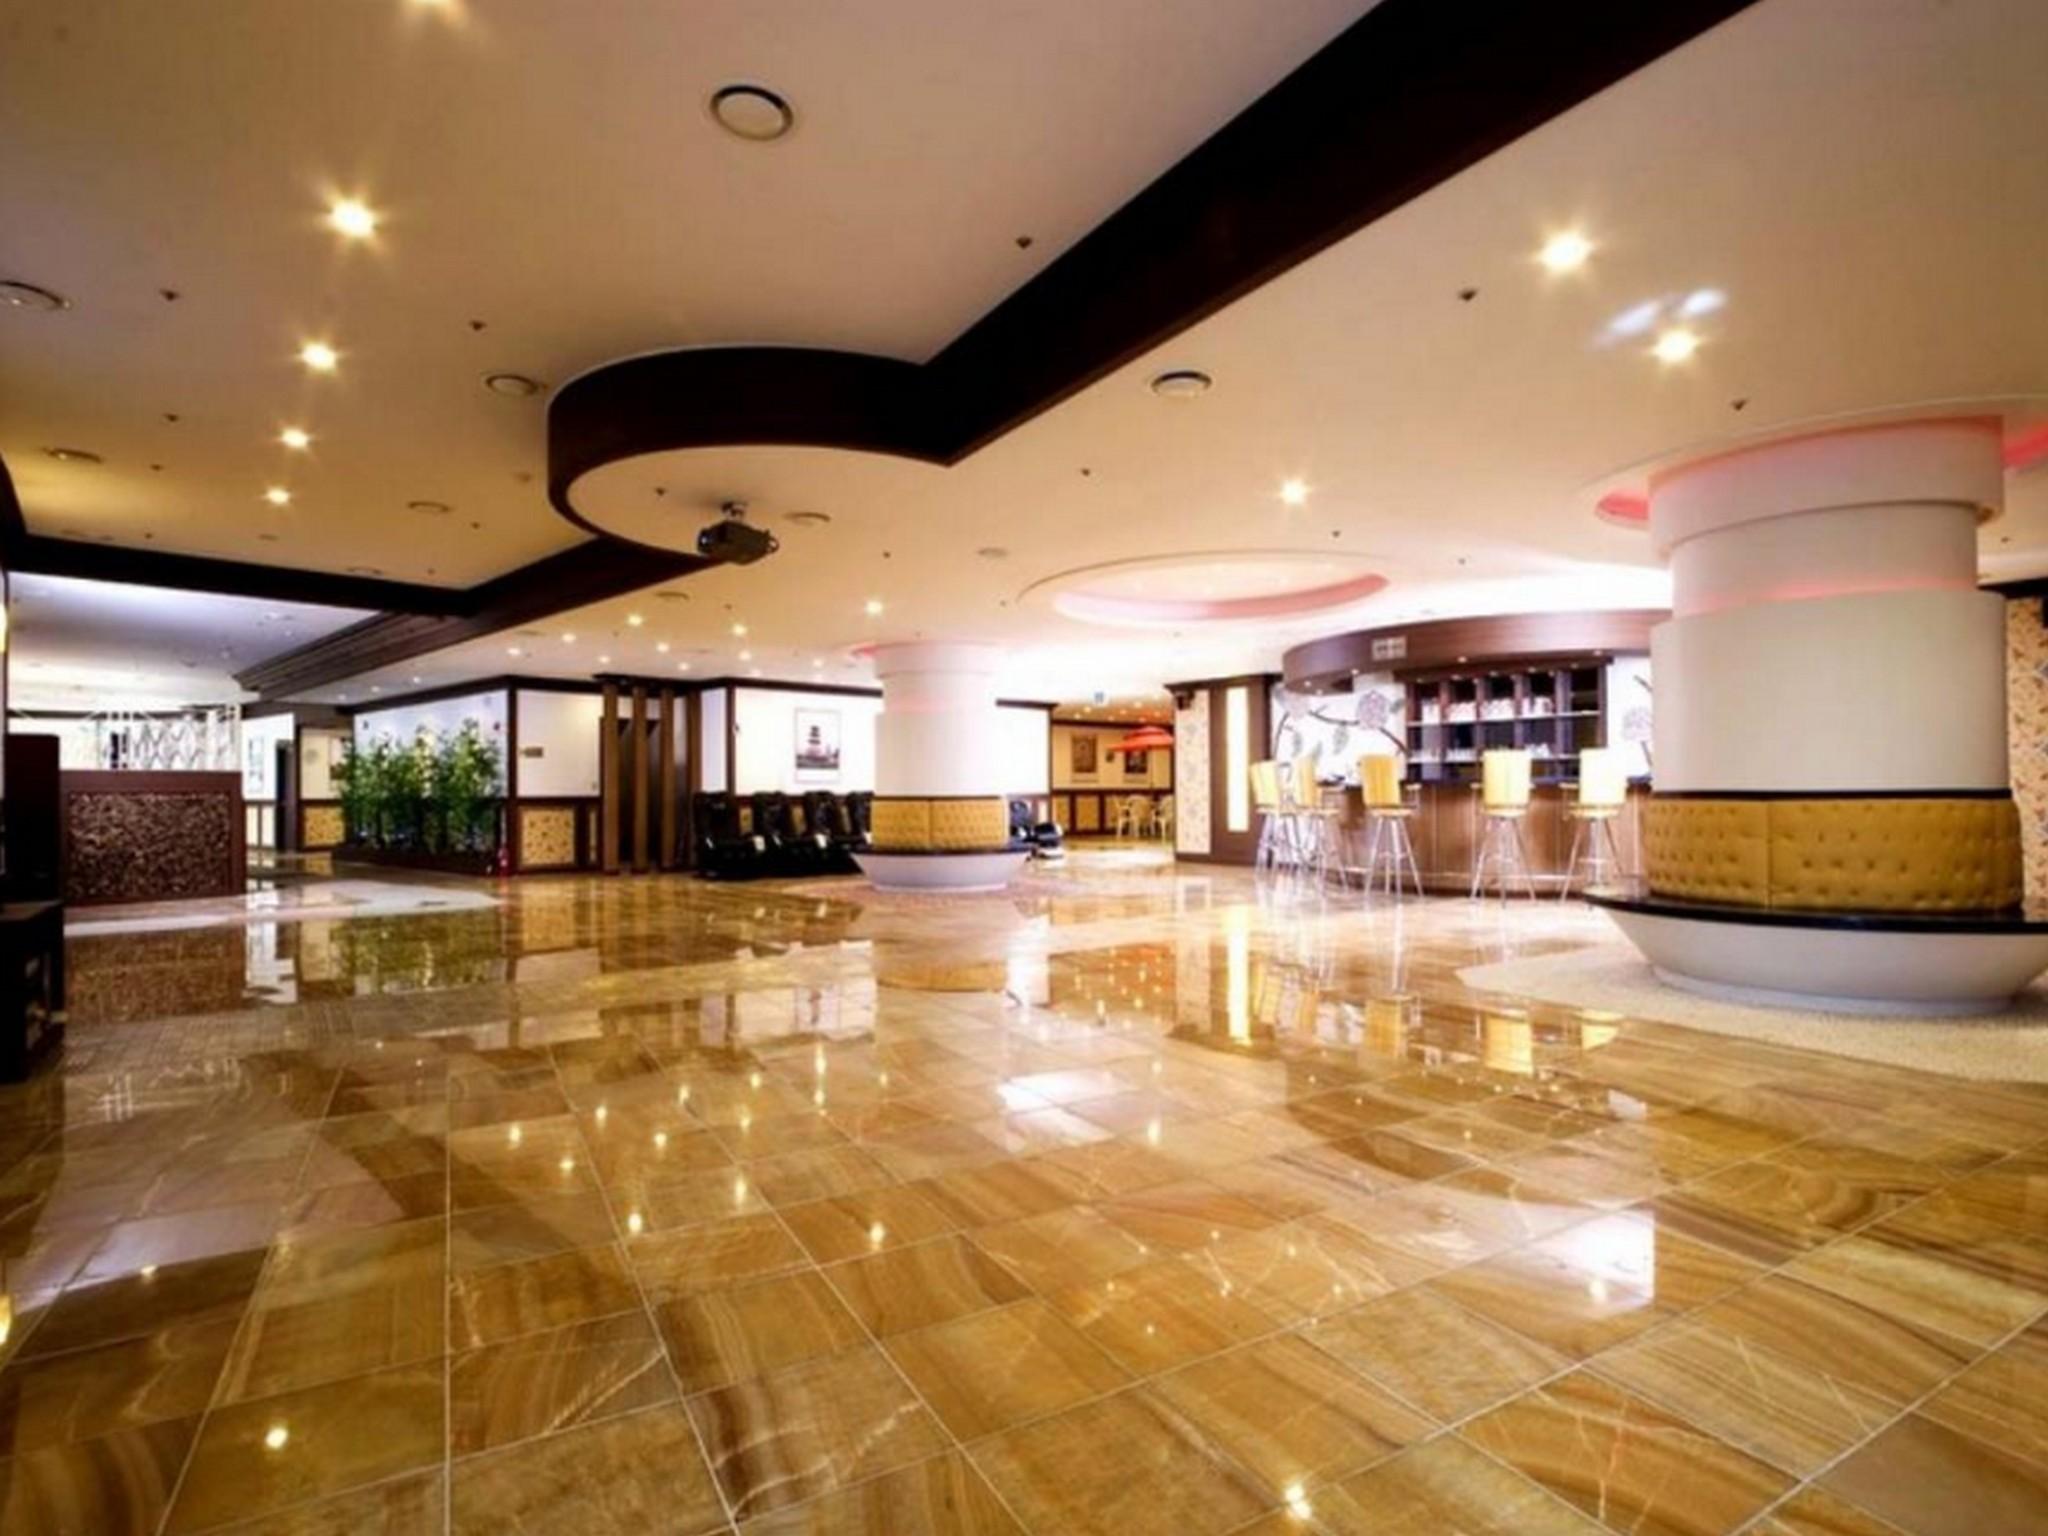 Gallery image of Chosun Spa